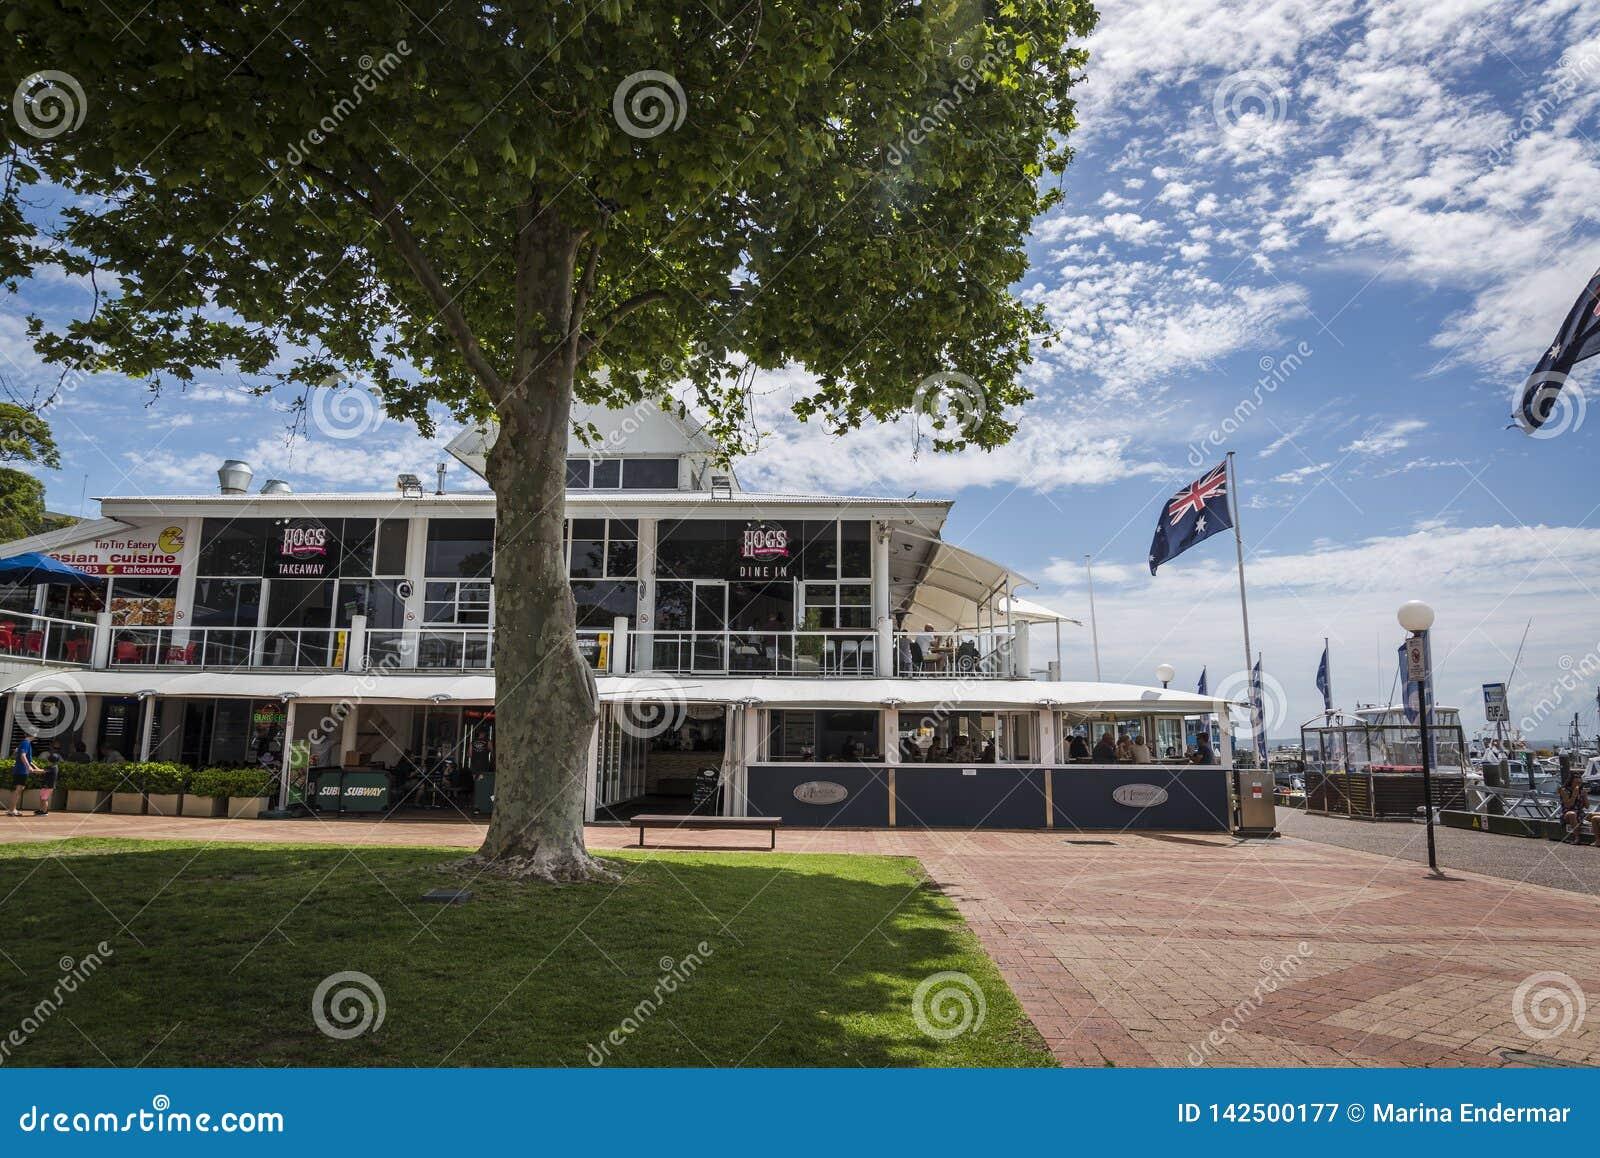 Стейкхаус Австралии борова, залив Нельсон, NSW, Австралия